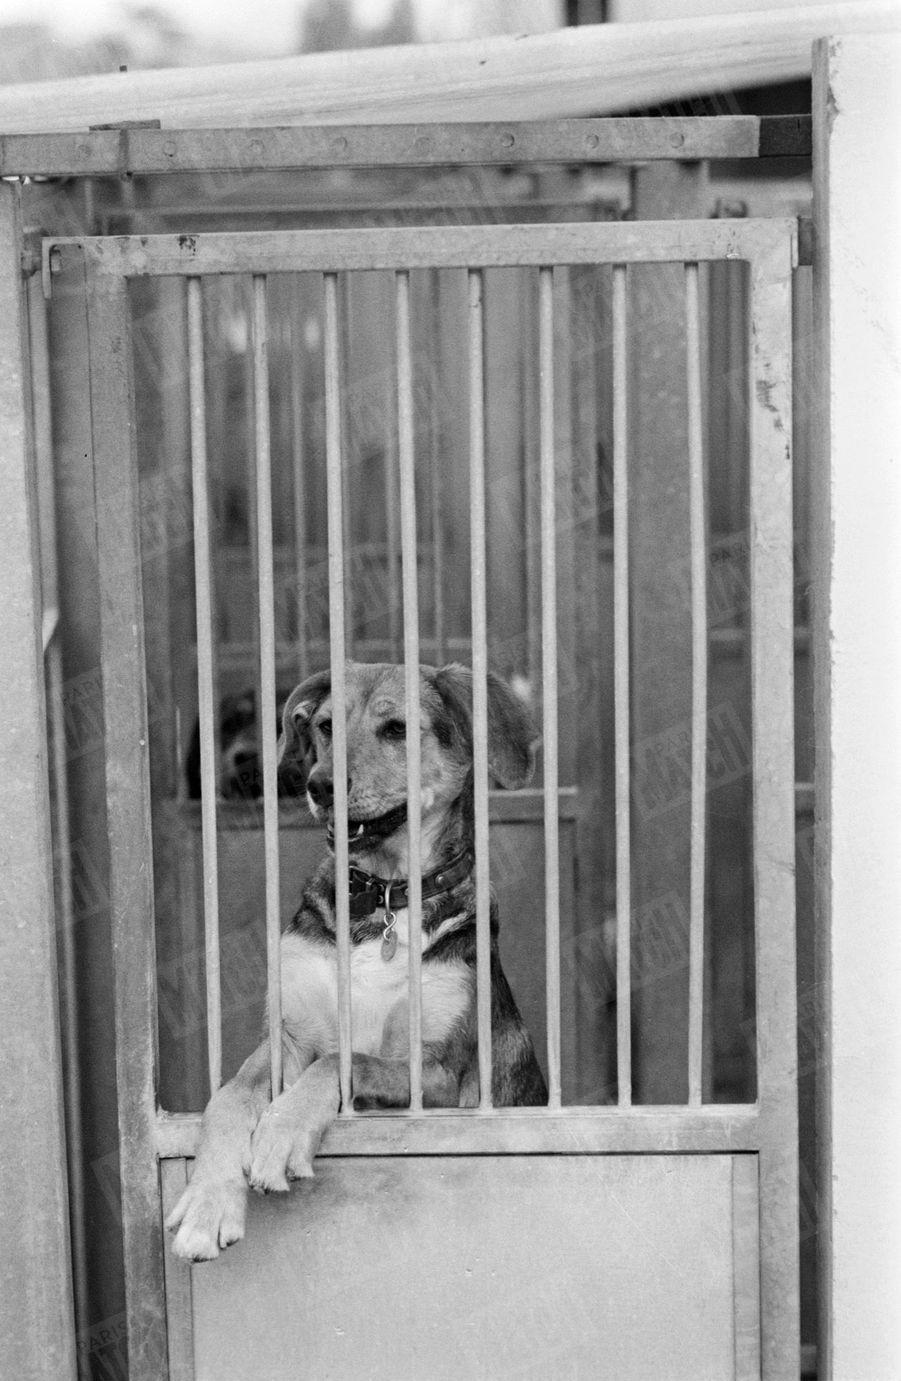 Un chien à adopter, au refuge SPA Grammont de Gennevilliers.